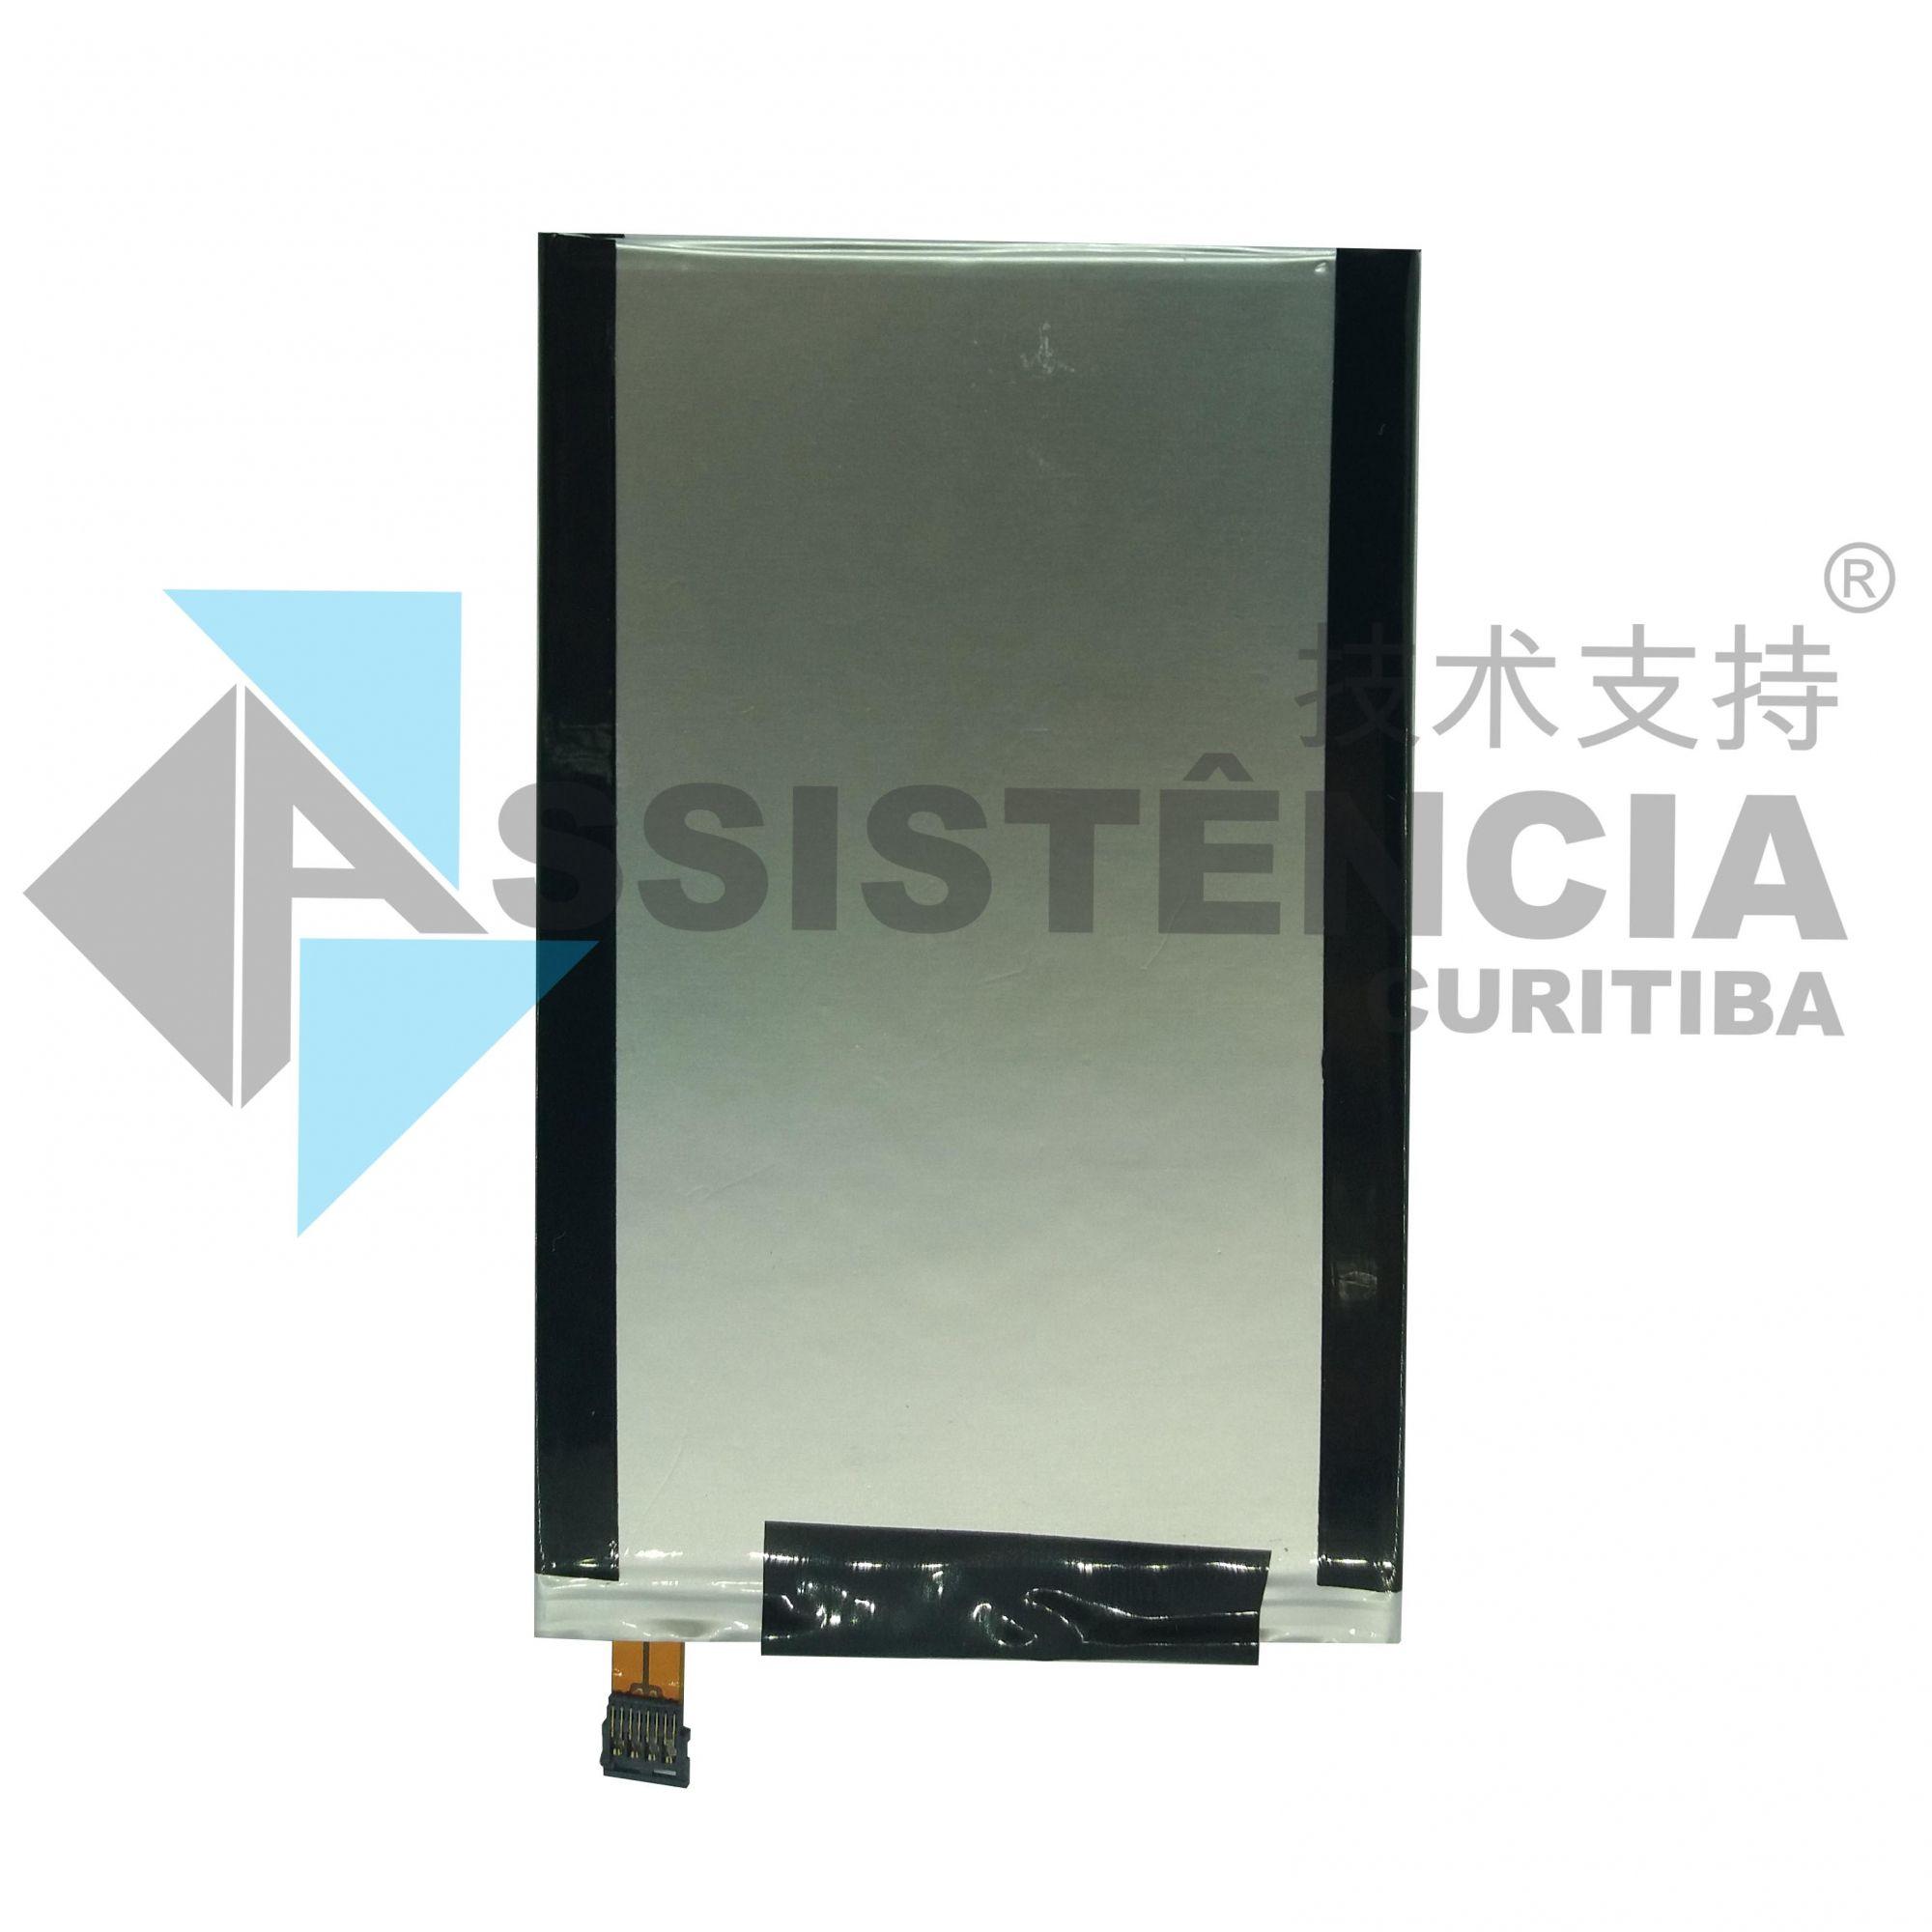 Bateria Motorola Fl40